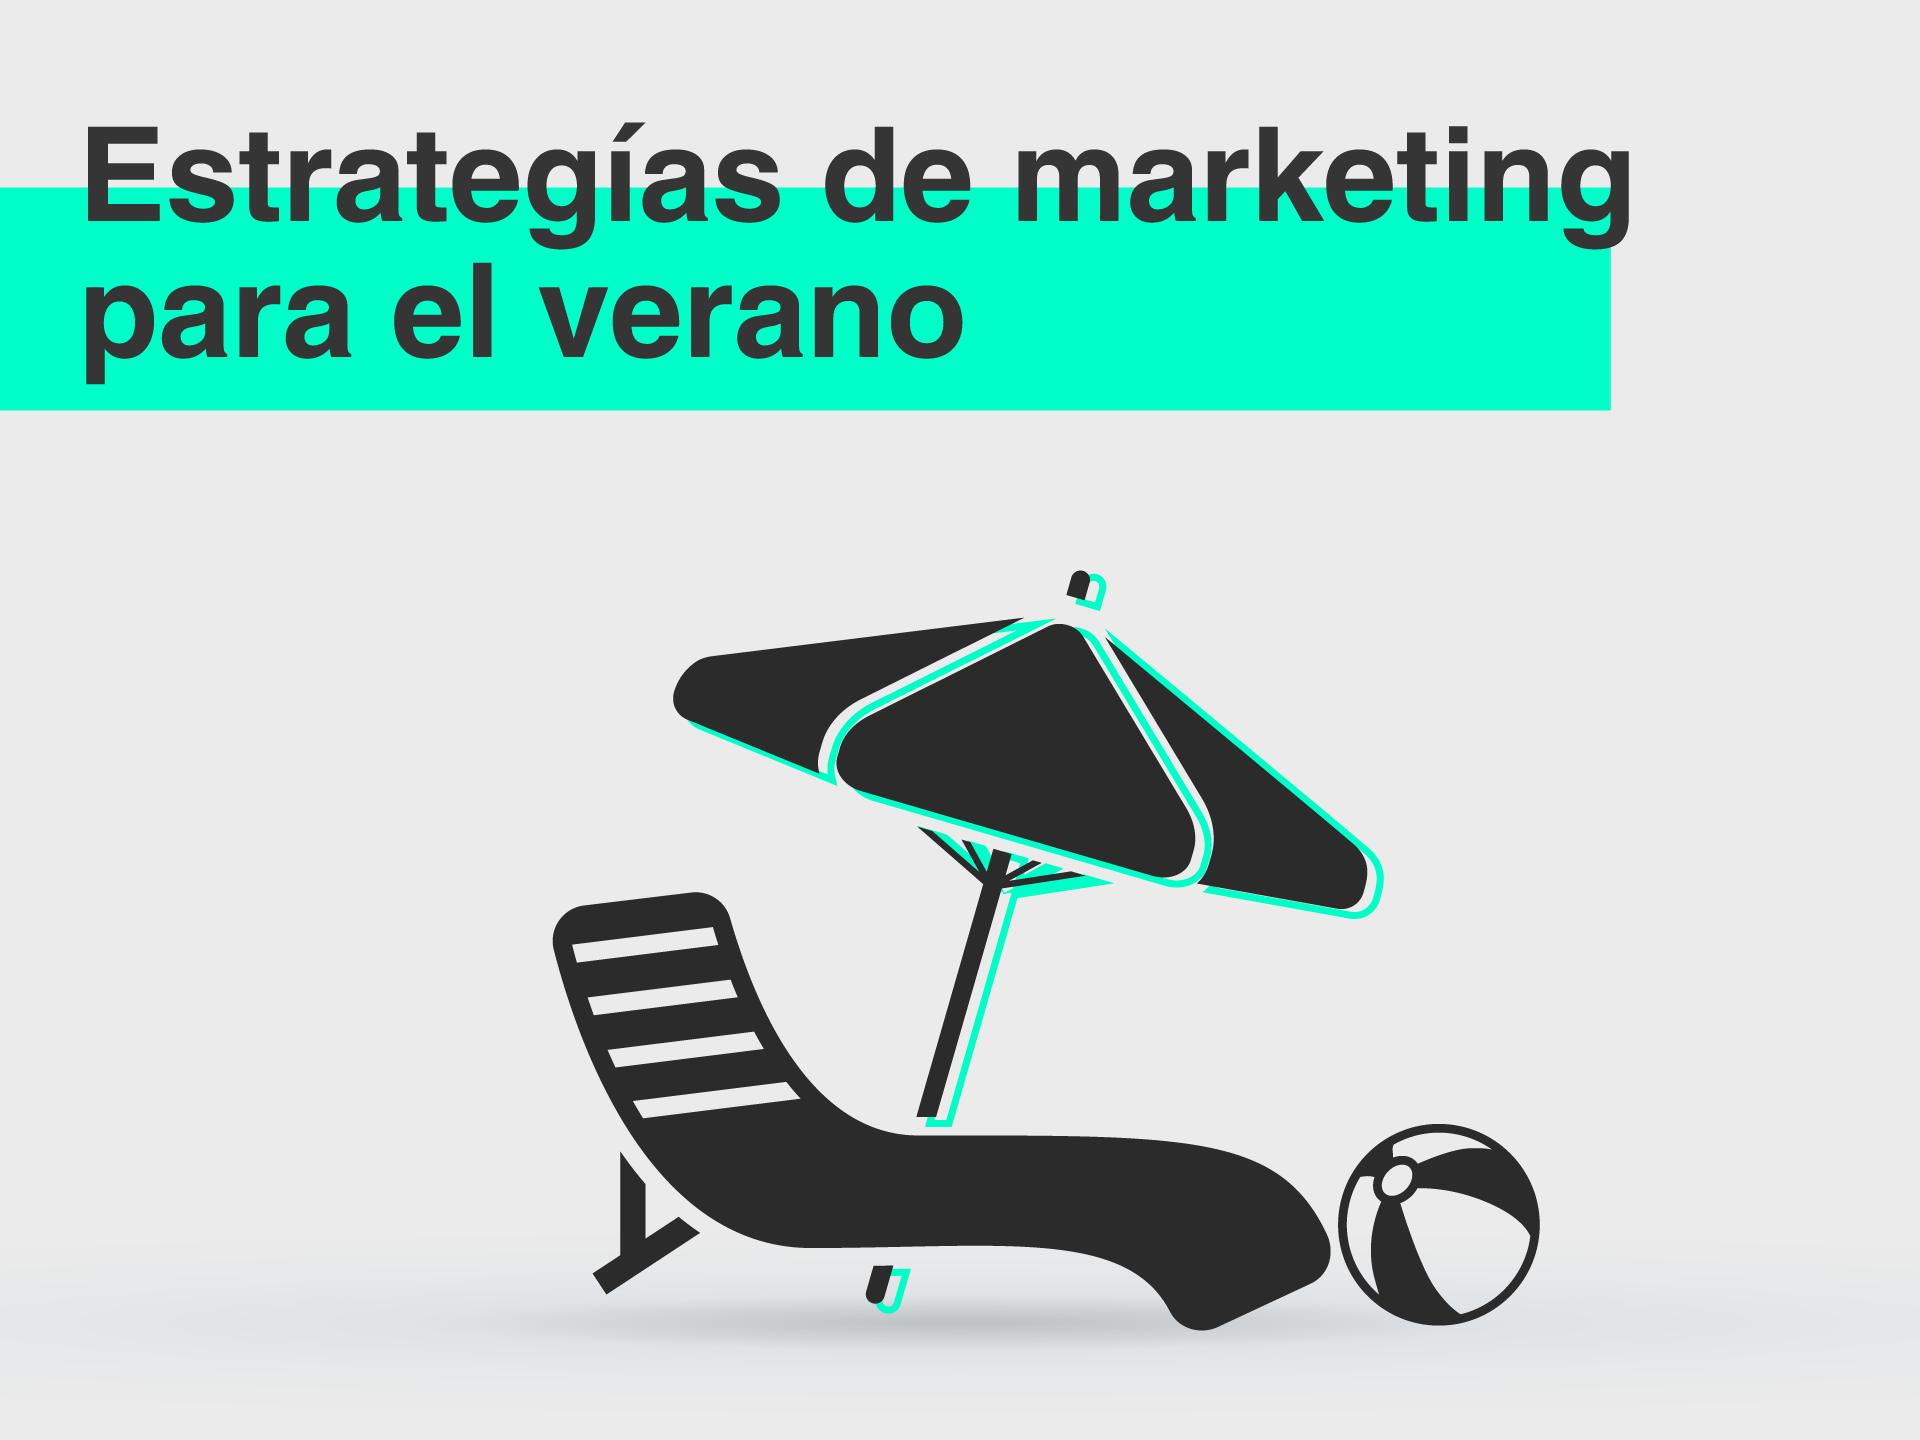 estrategia de marketing para verano